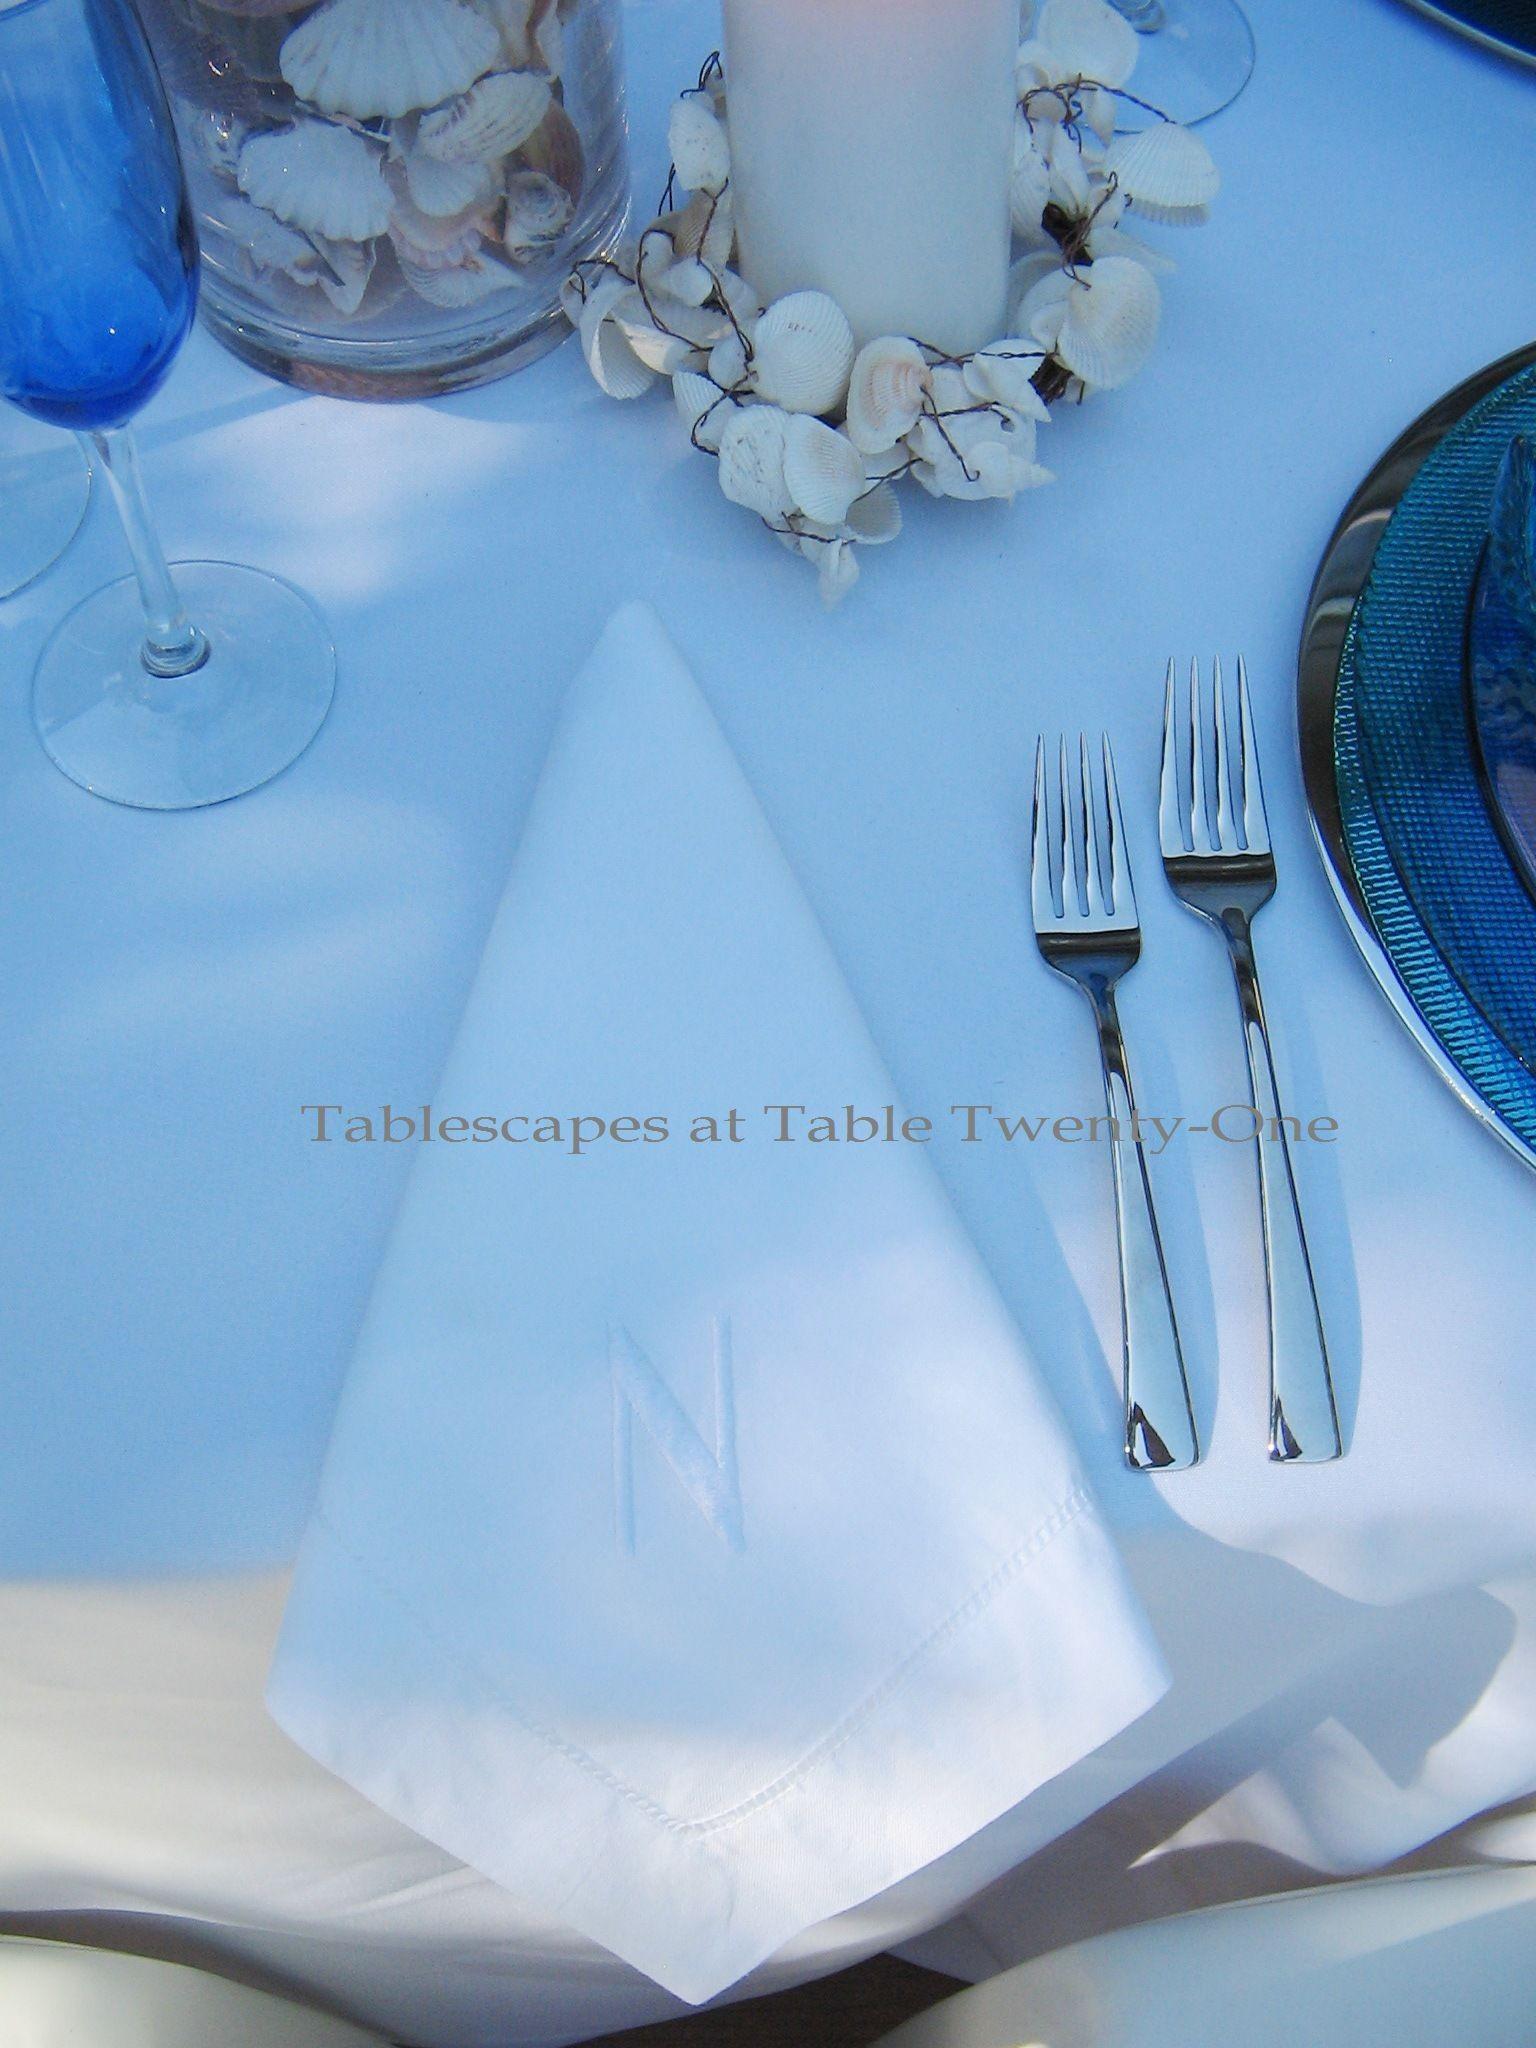 Tablescapes at Table Twenty-One, www.tabletwentyone.wordpress.com, Ocean Blue – Starfish & Seashells:  White cotton napkin with initial